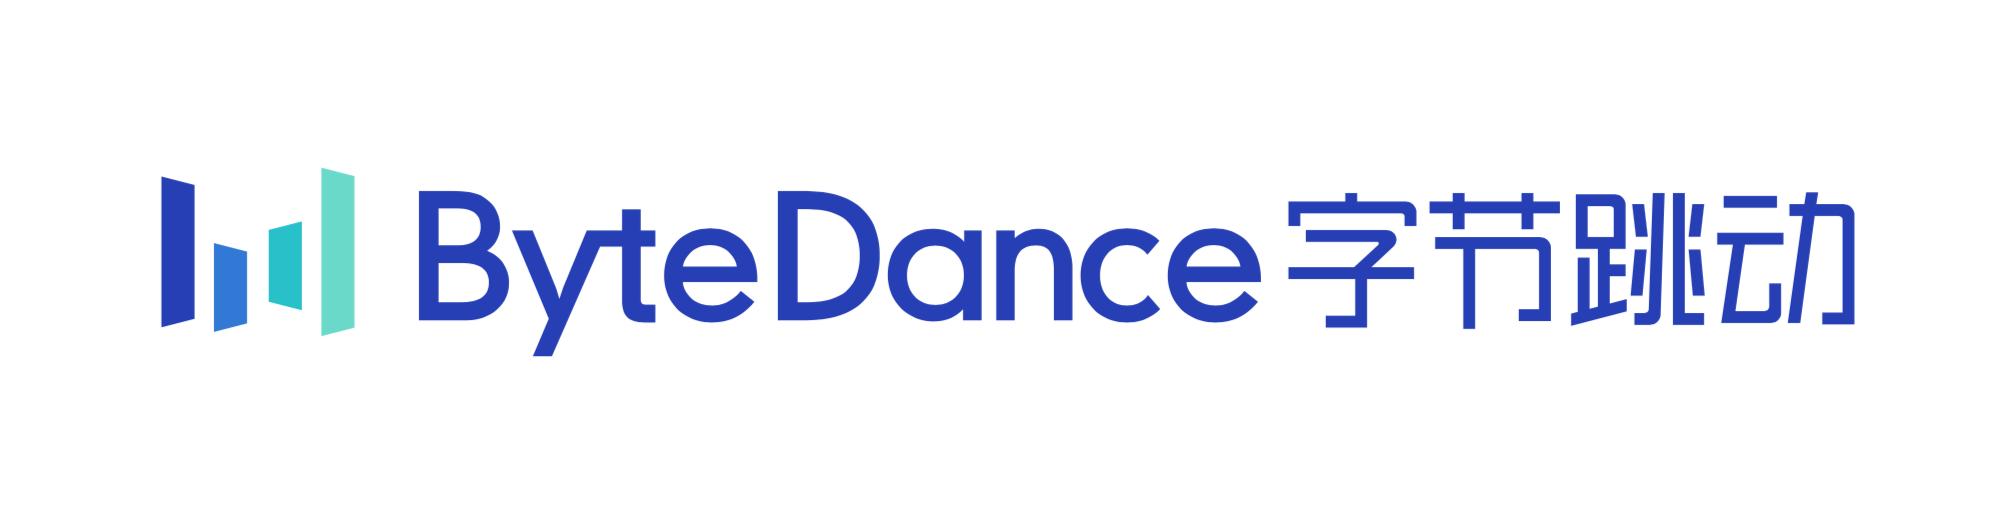 Logo of ByteDance